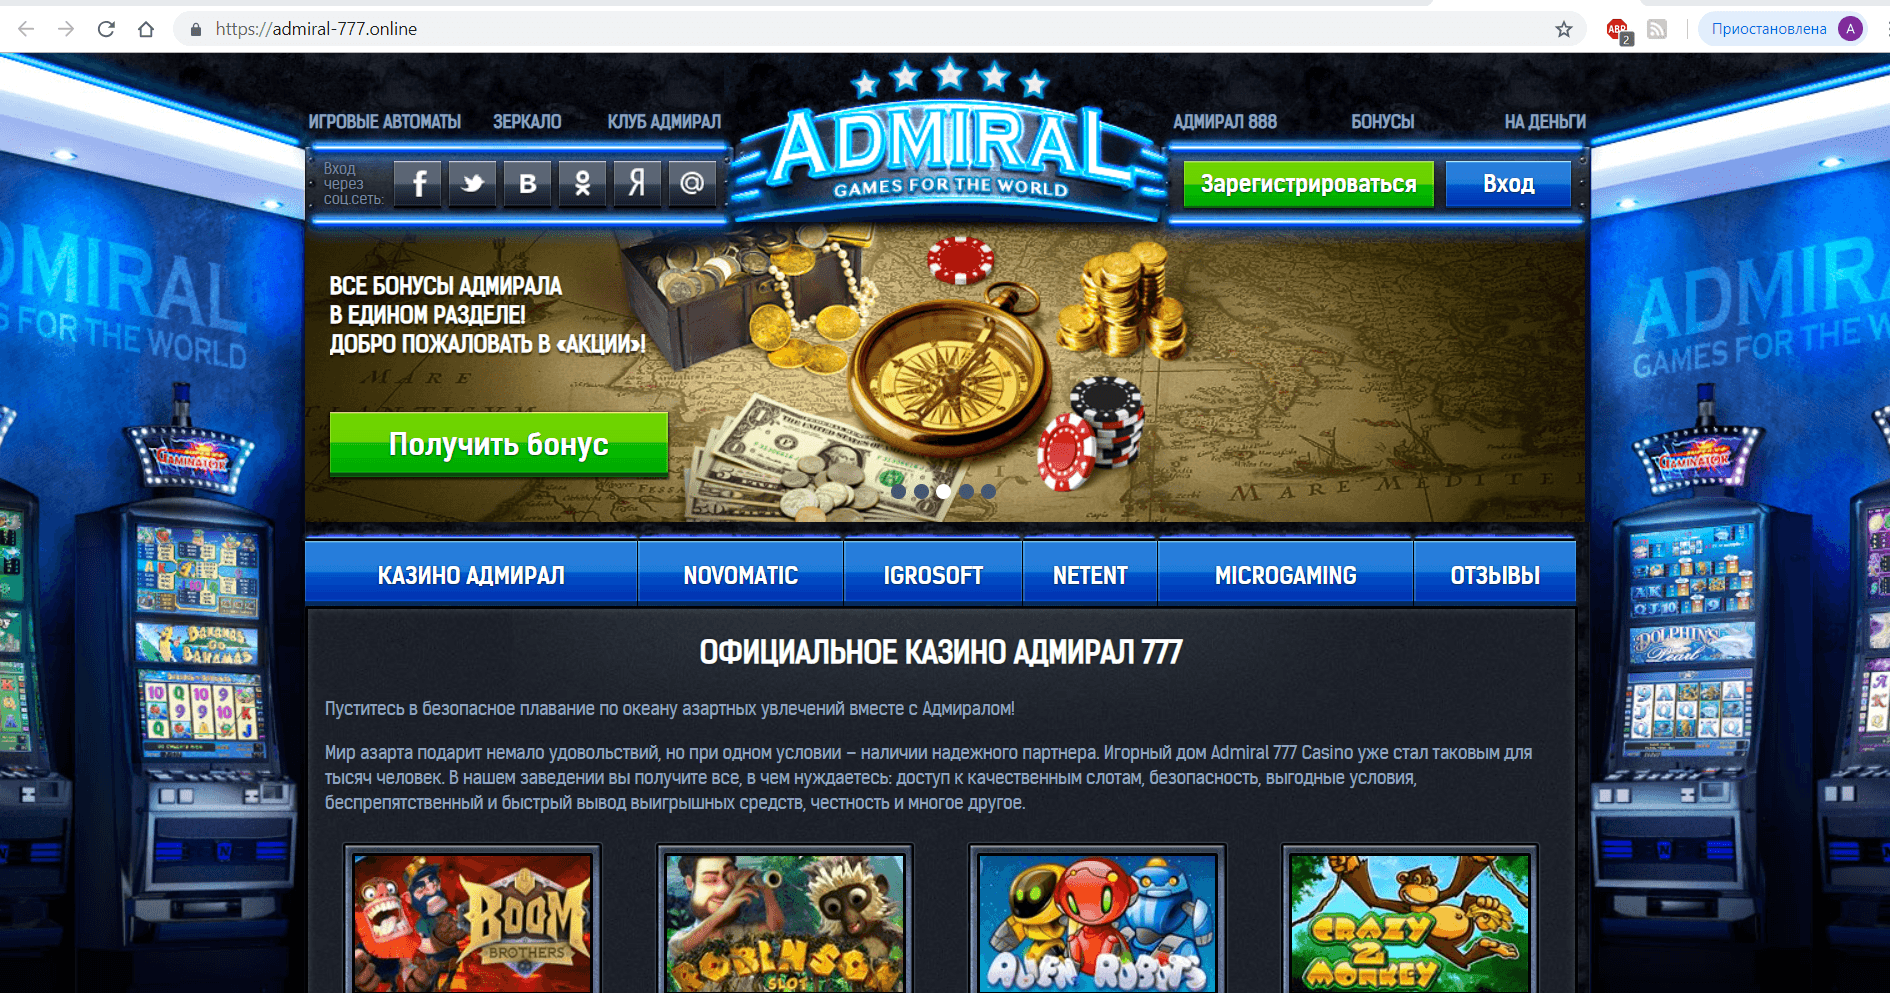 Проверка key games casino